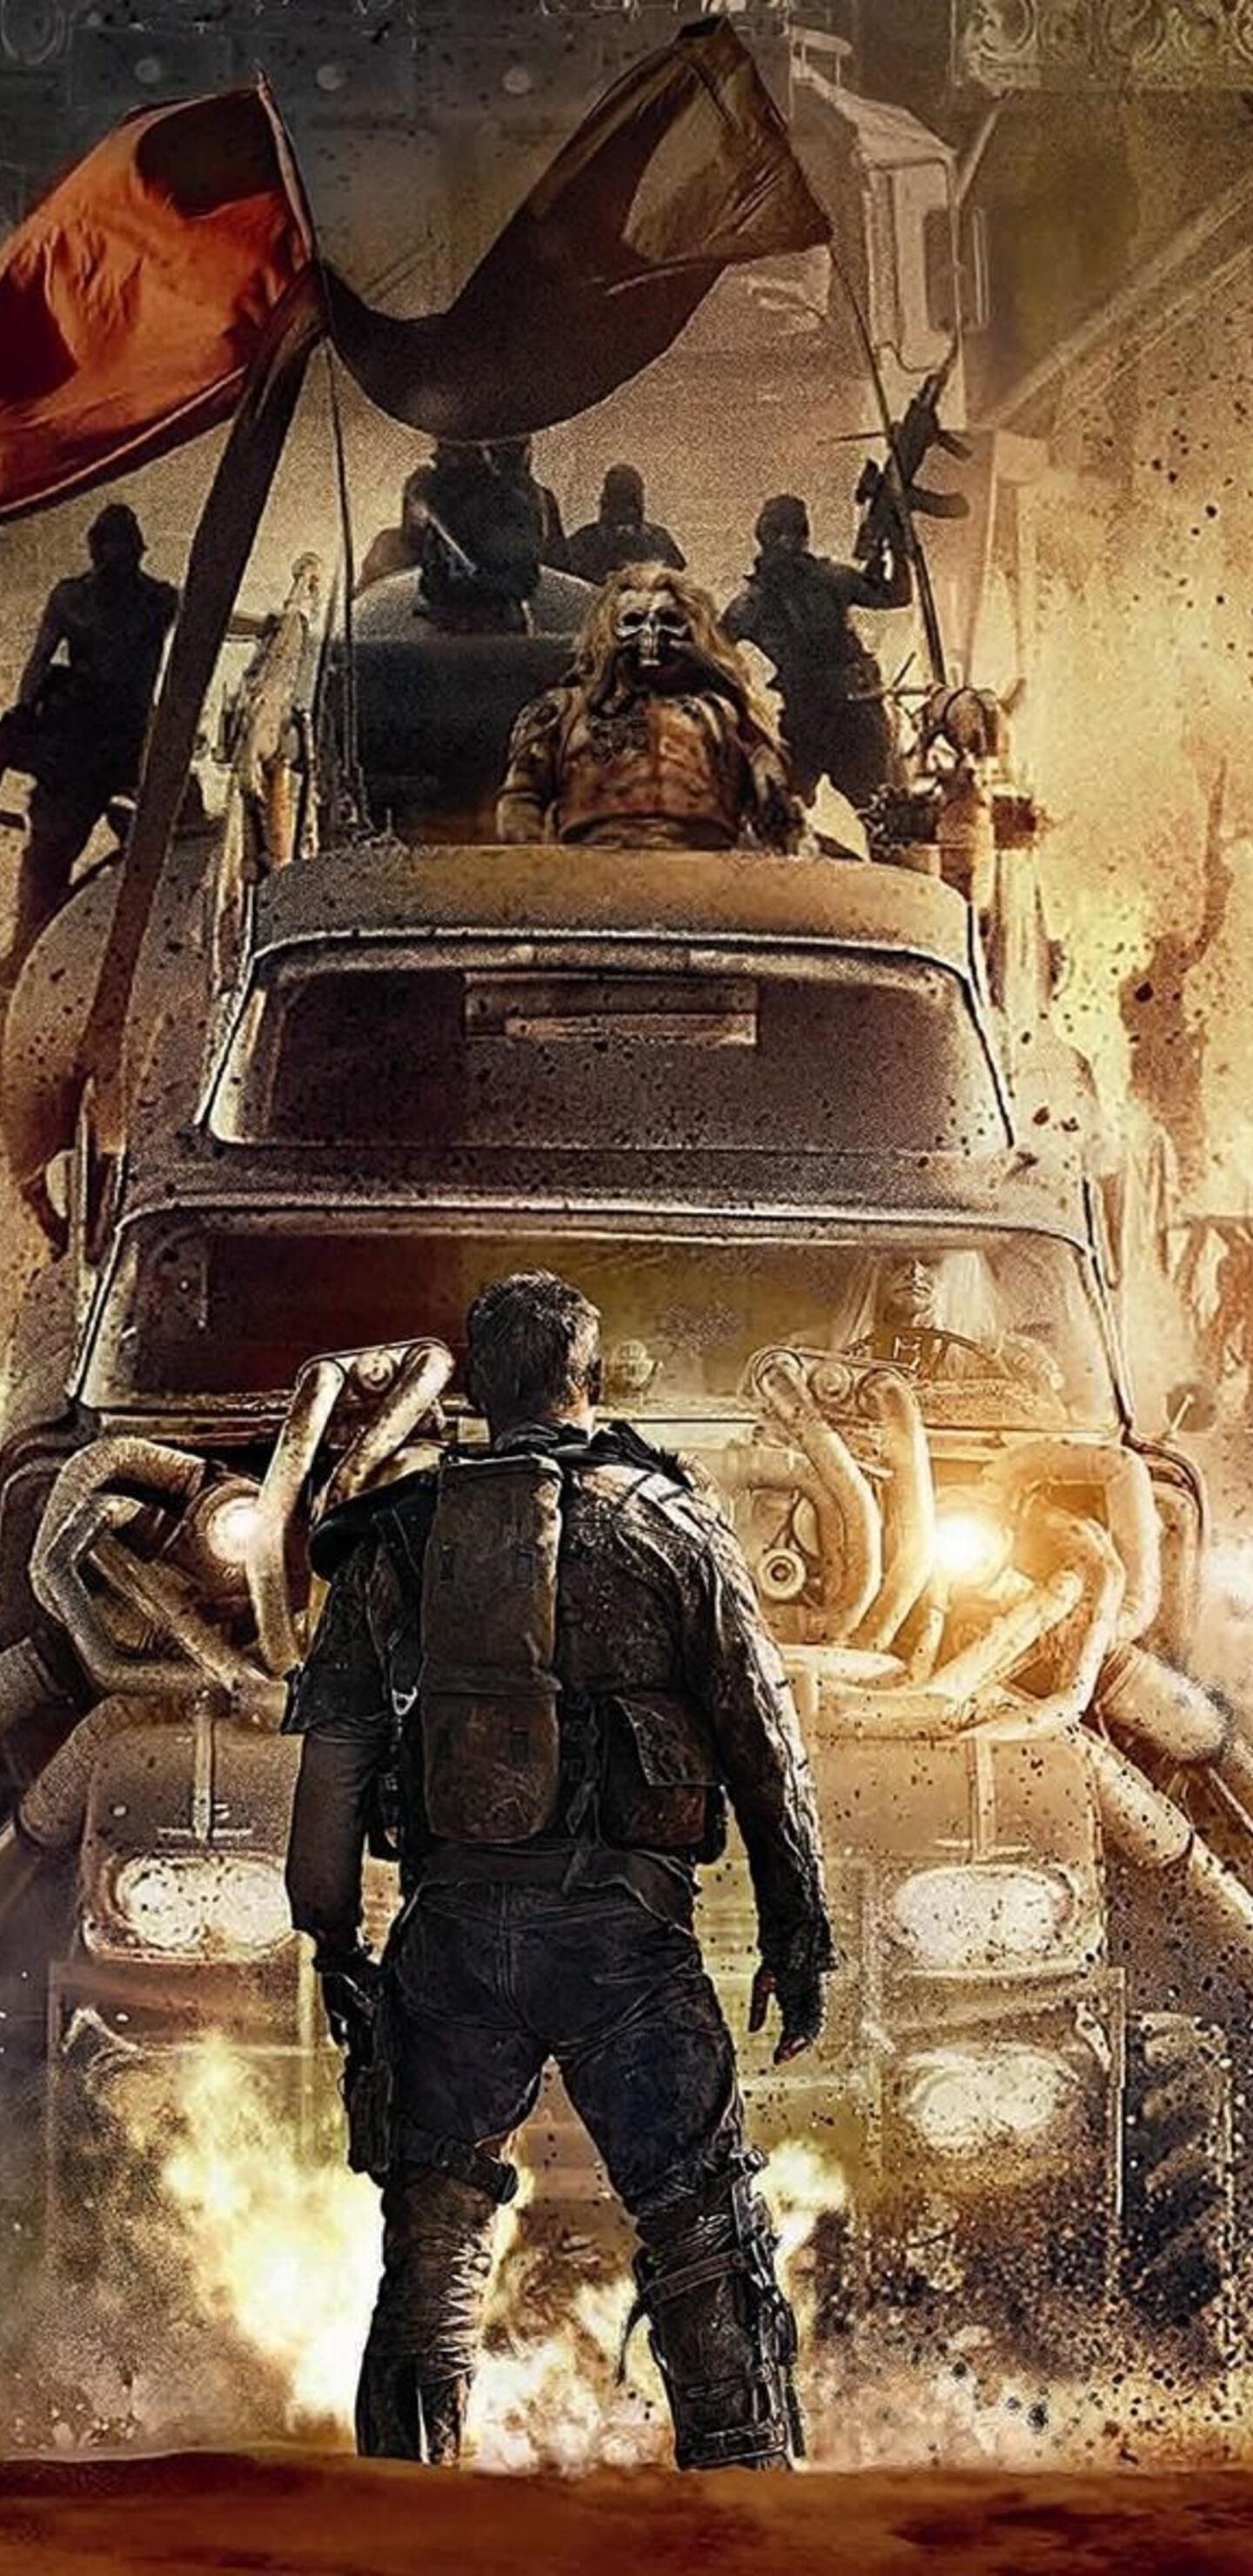 1440x2960 Mad Max Fury Road Movie Samsung Galaxy Note 98